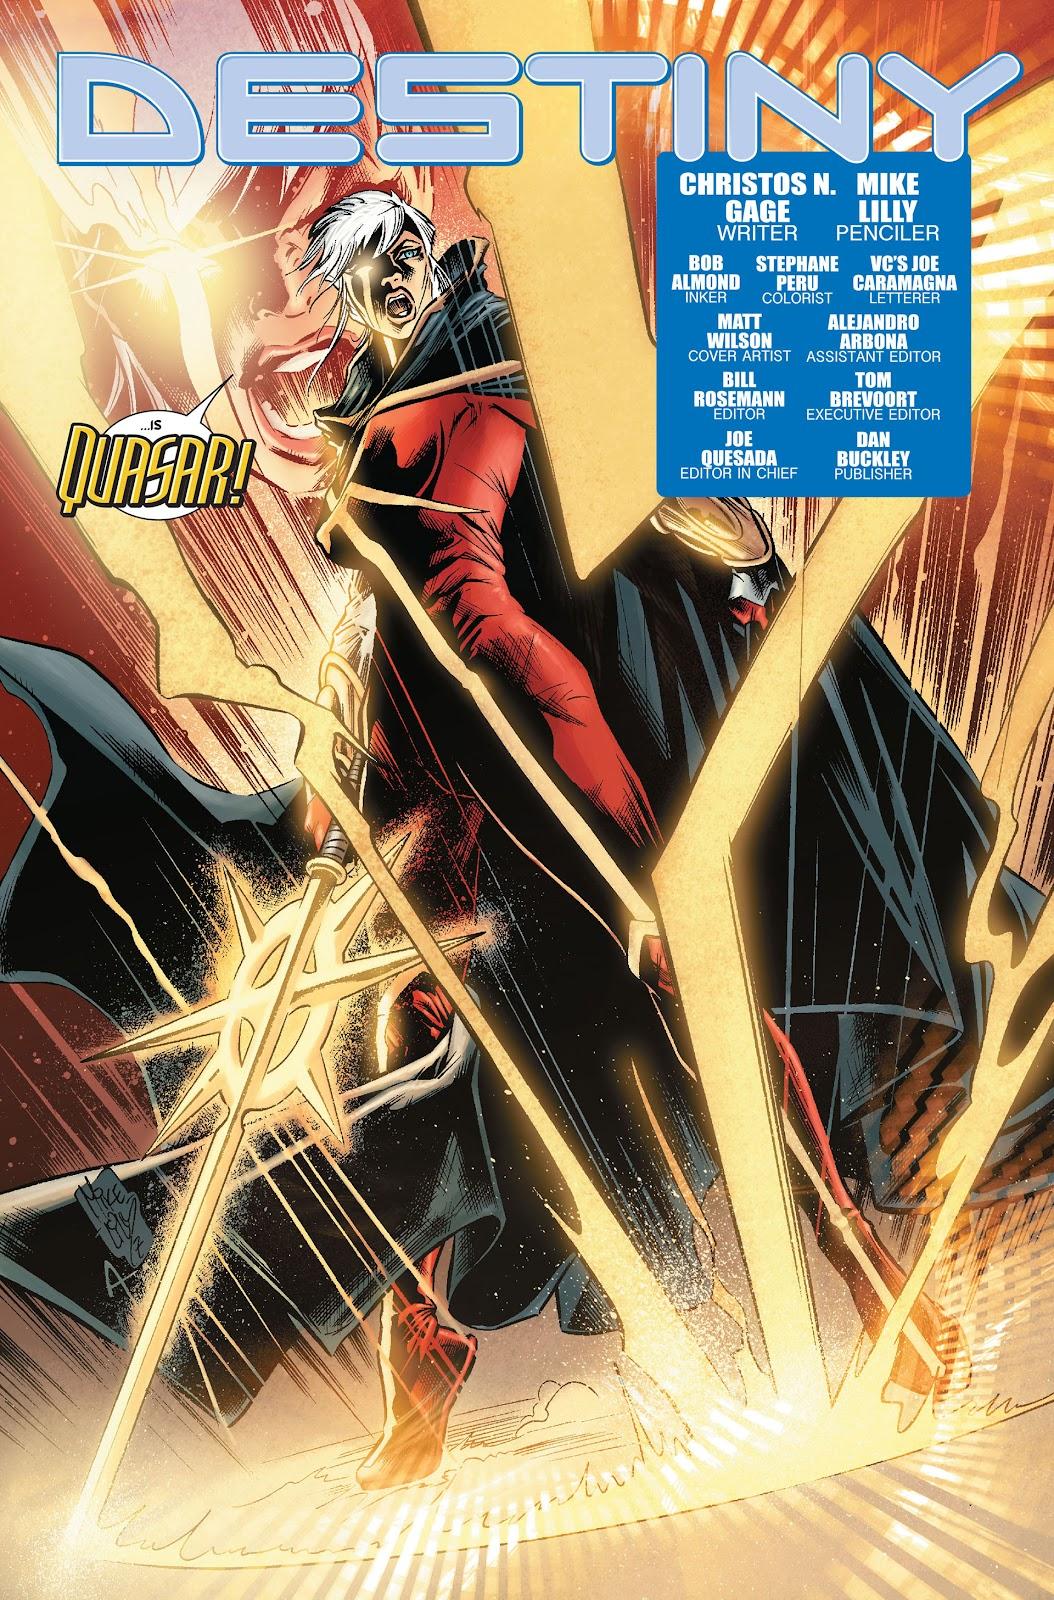 Annihilation: Conquest - Quasar issue 1 - Page 5